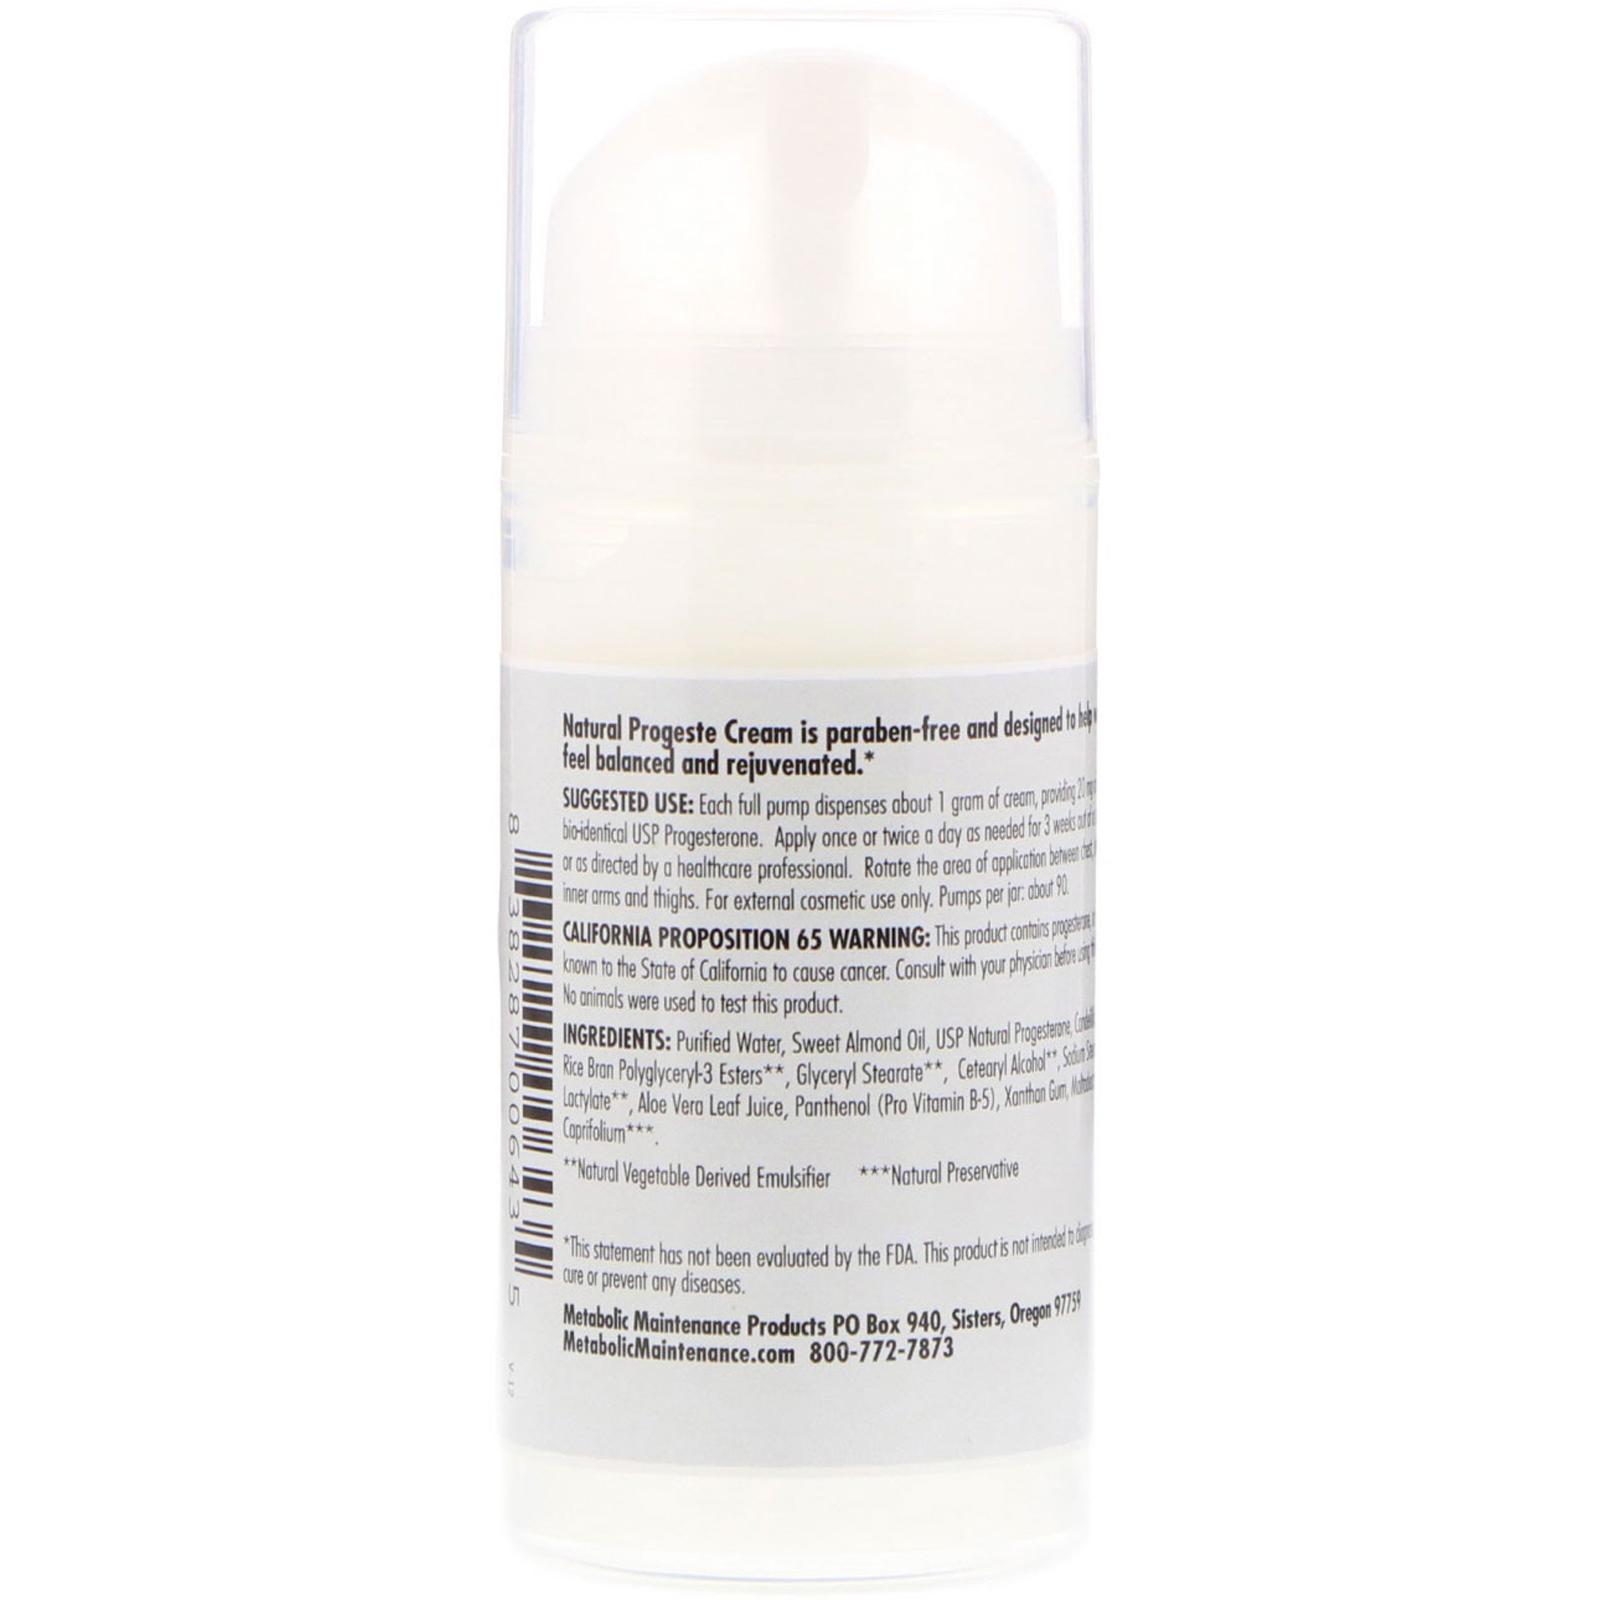 Natural Progesterone Cream Reviews Uk